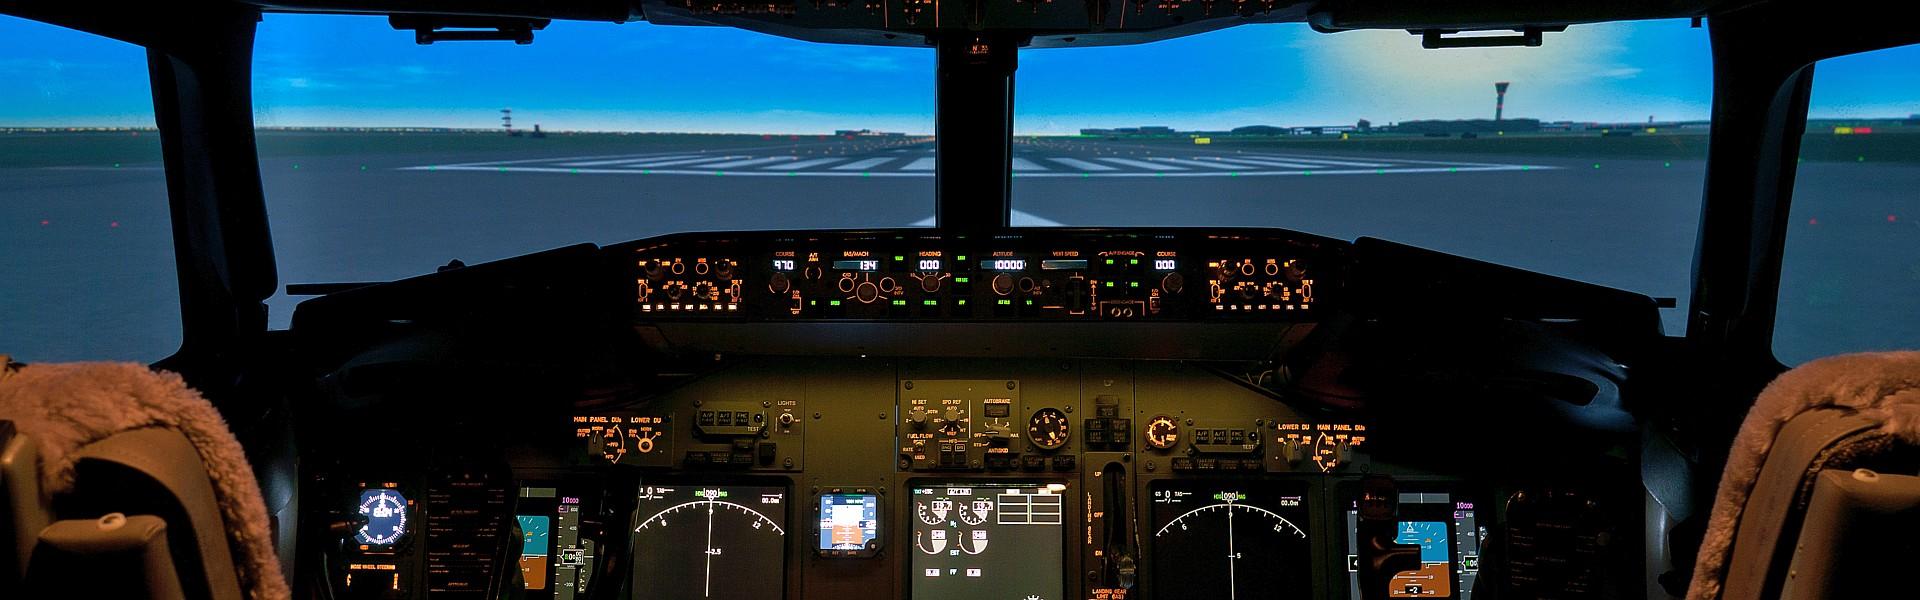 Fixed Based Flight Simulator Training for Aviation Safety